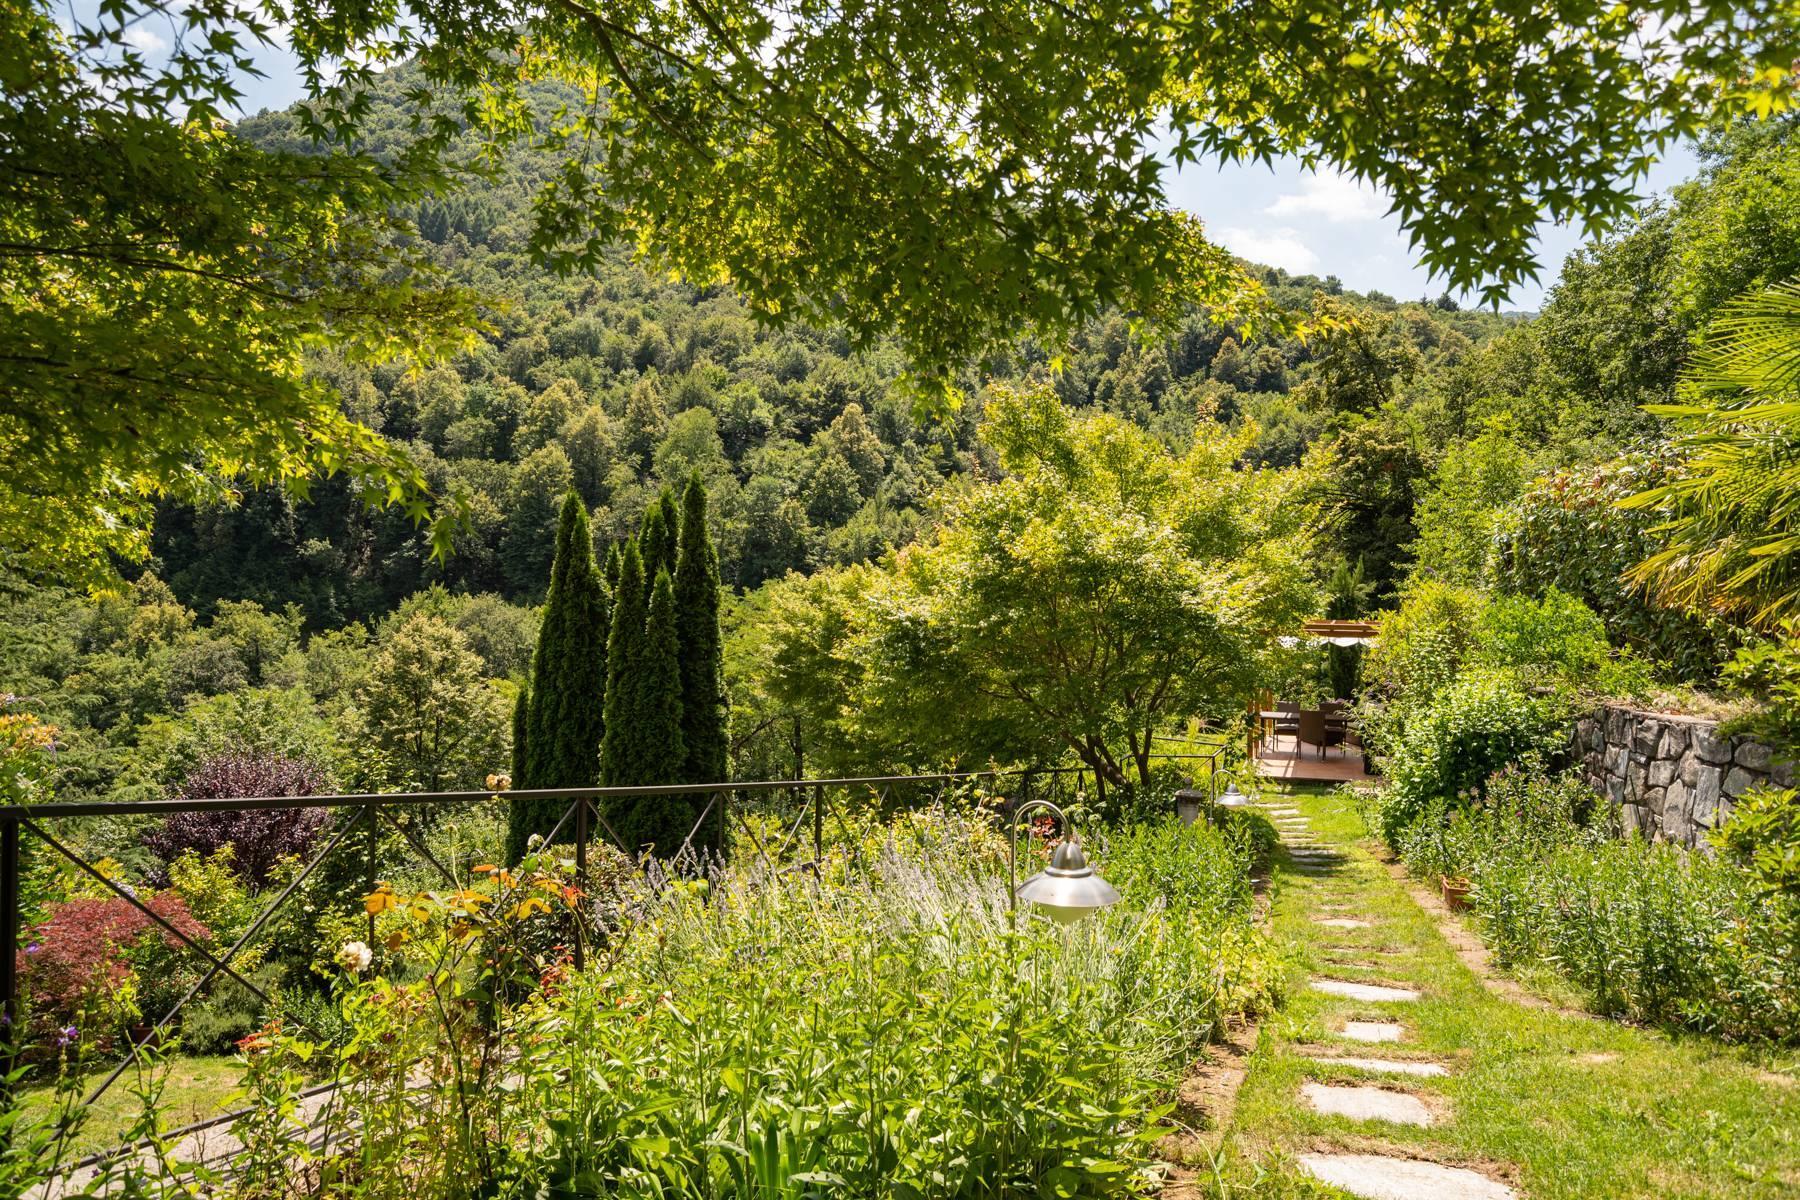 Splendida villa moderna sulla collina soleggiata sopra Argegno - 10